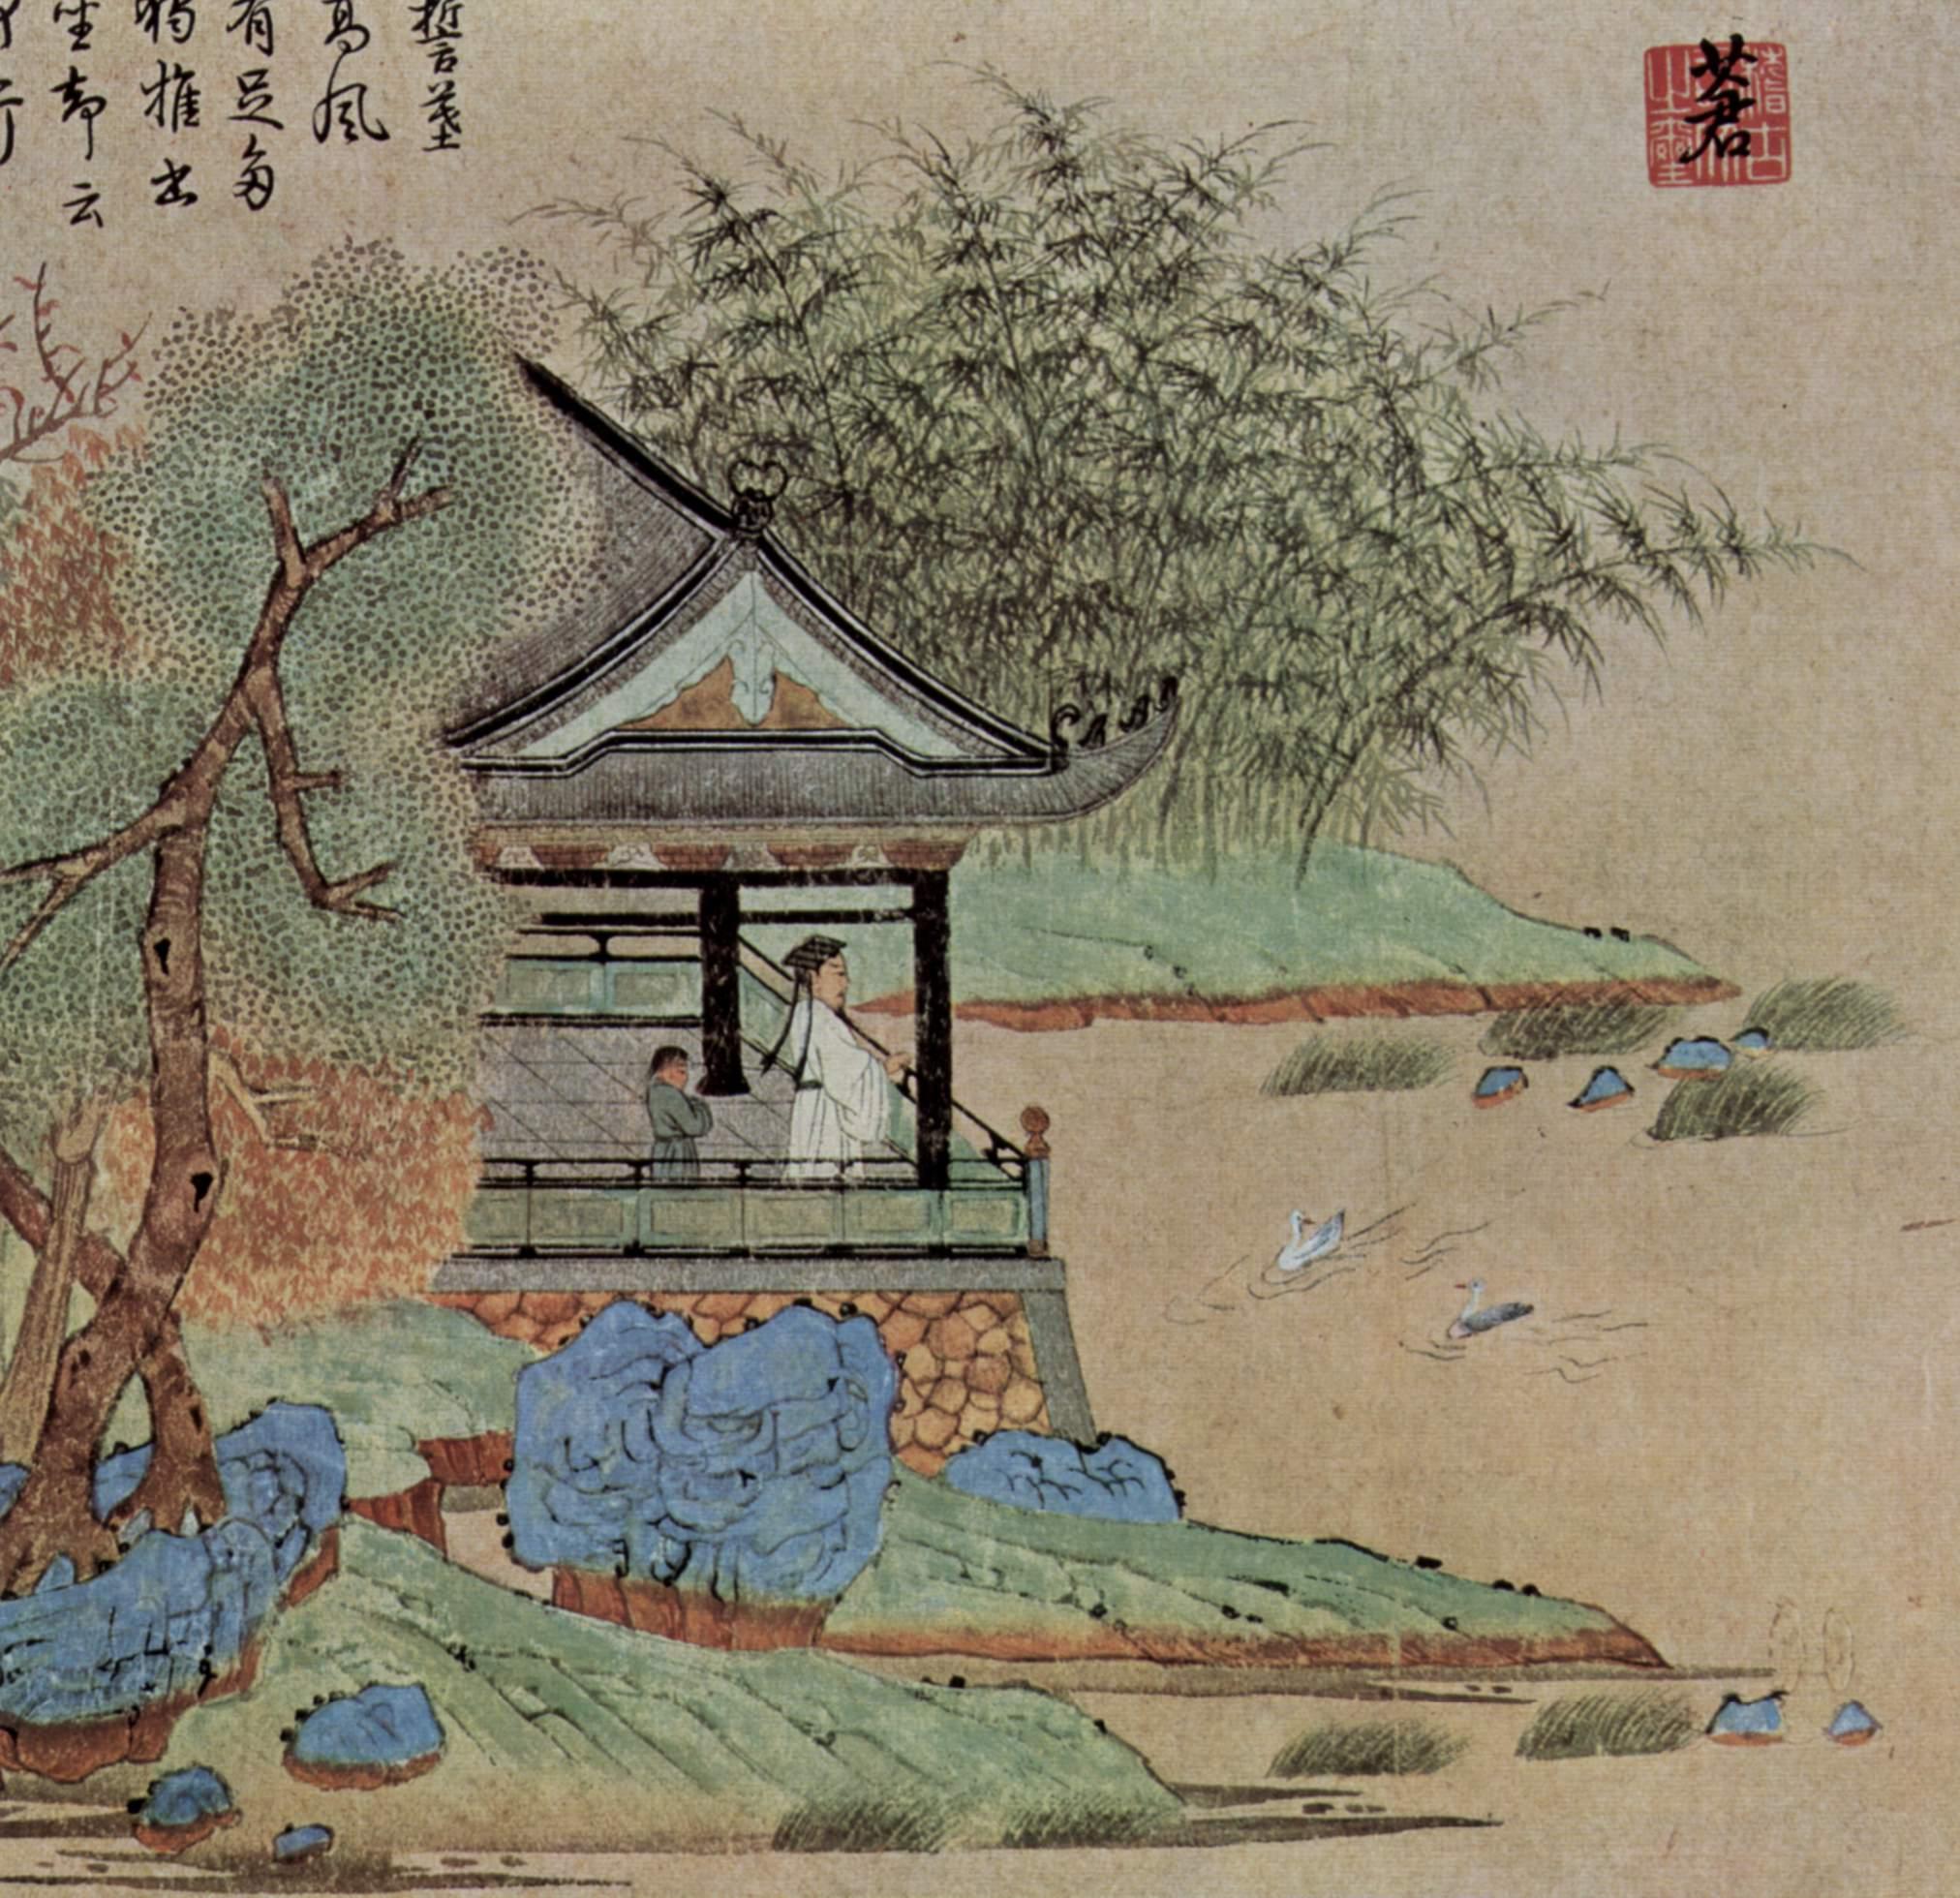 Geese in chinese poetry wikipedia vocabulary domestic versus wildedit buycottarizona